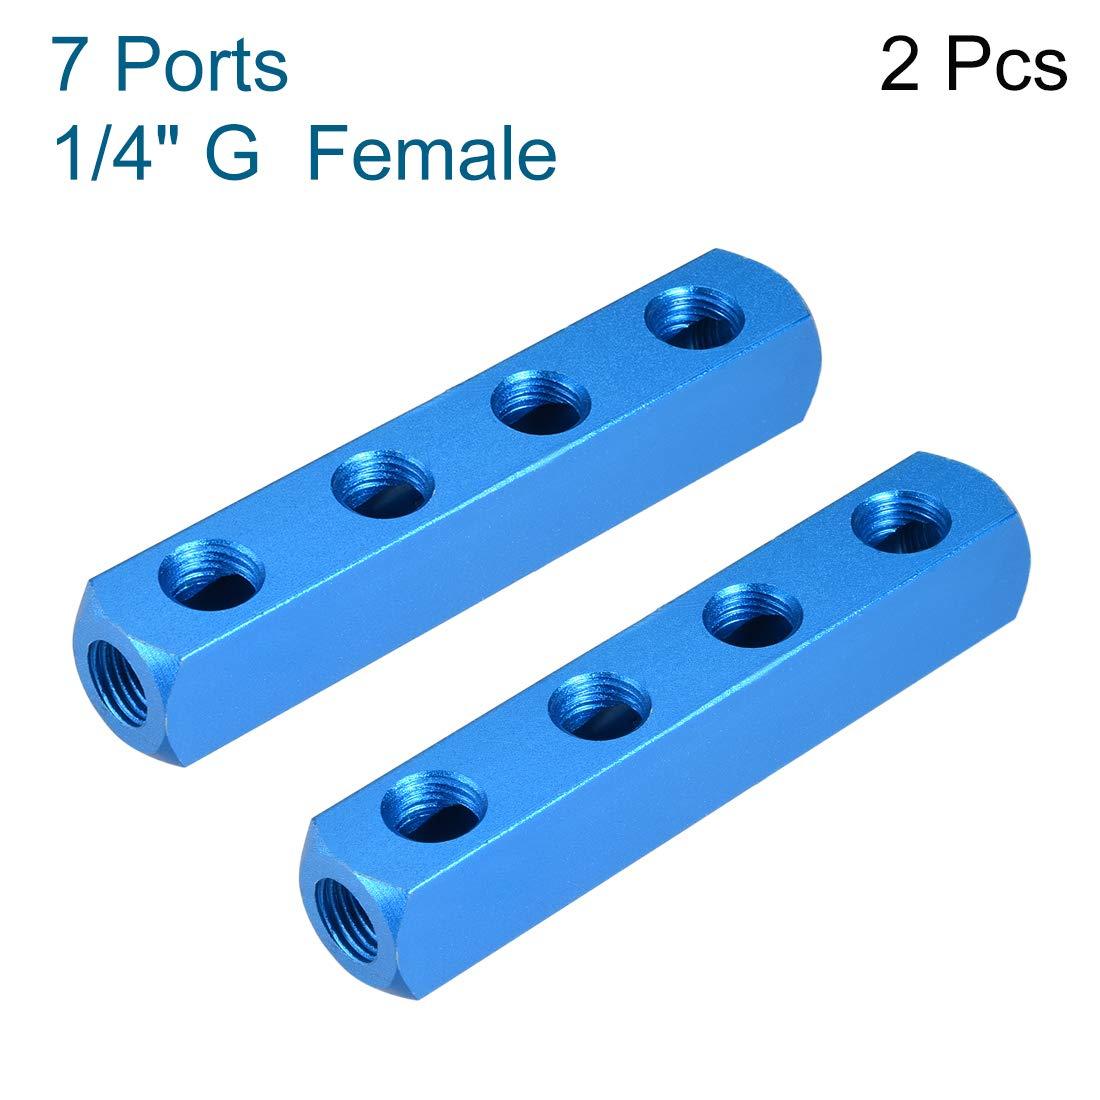 80//20 Inc Aluminum Angle 4.5 x 4.5 x .25 x 96.5 8241 N